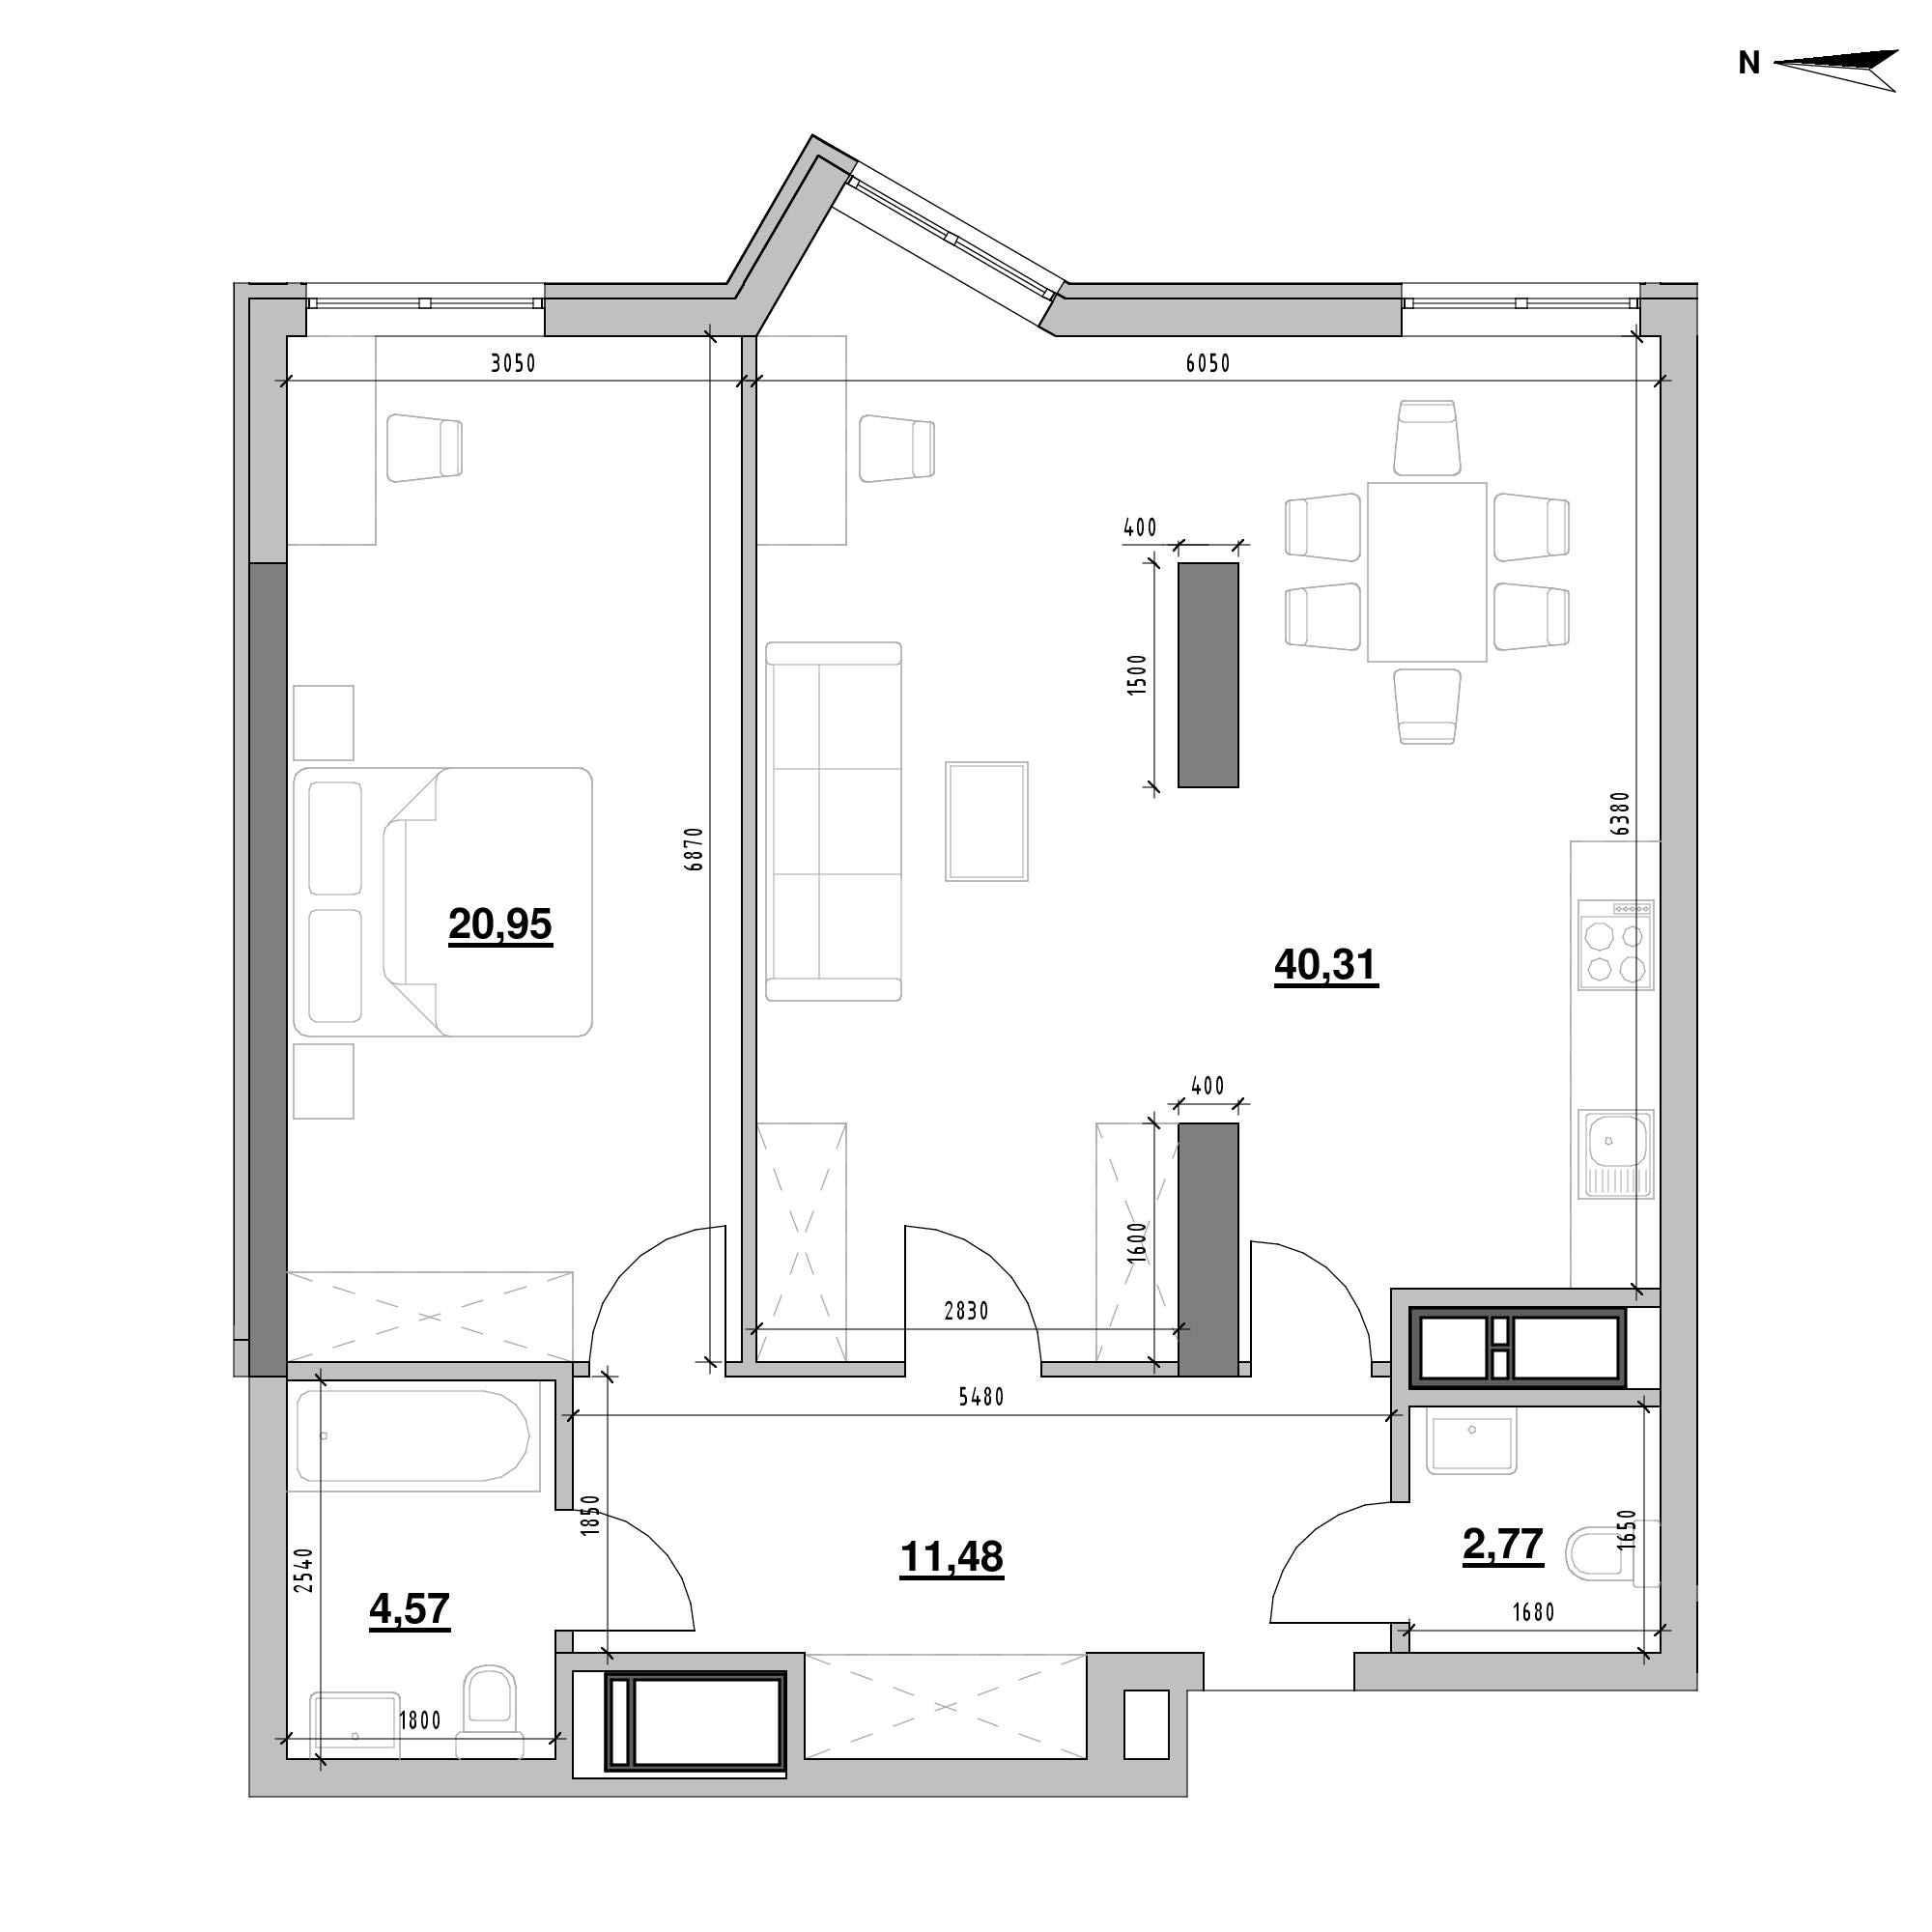 ЖК Nordica Residence: планування 1-кімнатної квартири, №17, 80.08 м<sup>2</sup>